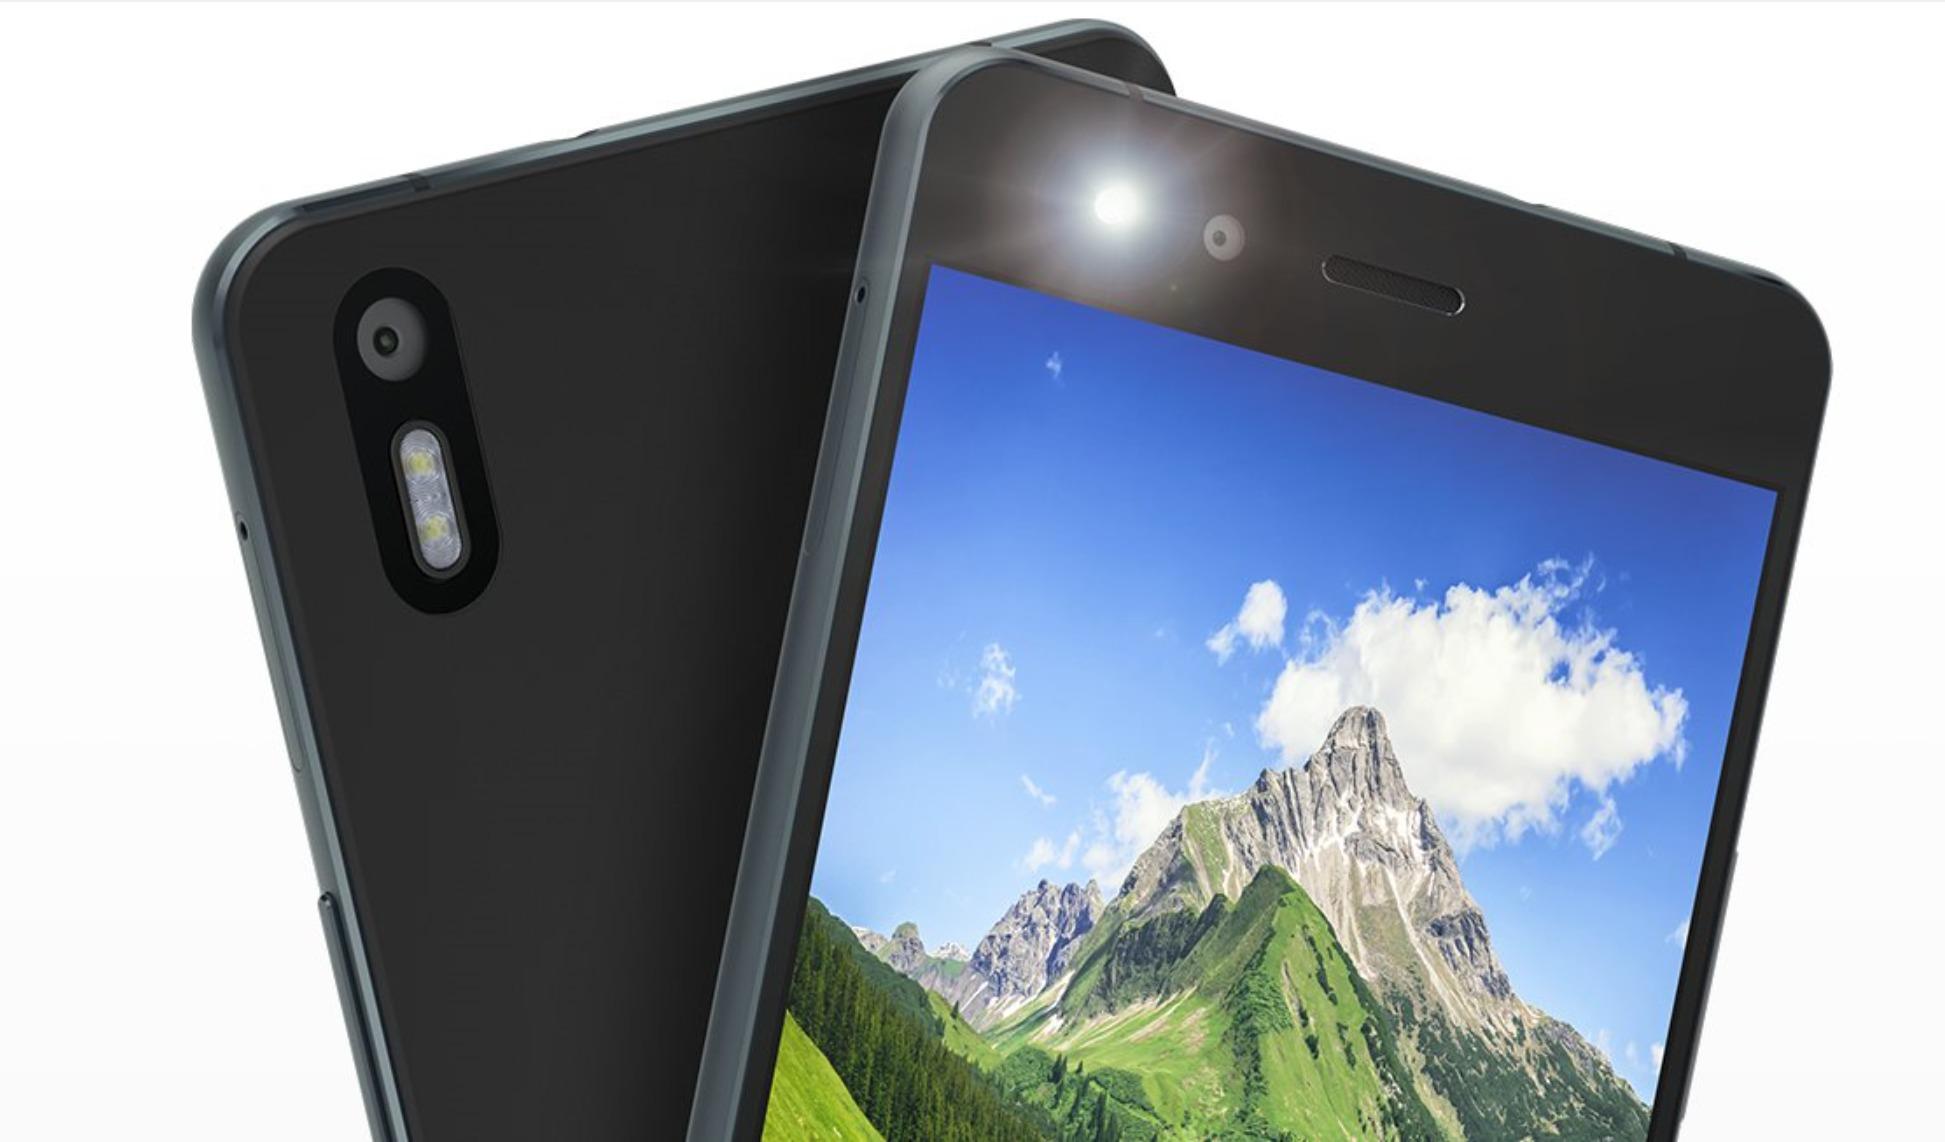 Denne mobilen leveres med Cyanogen OS.